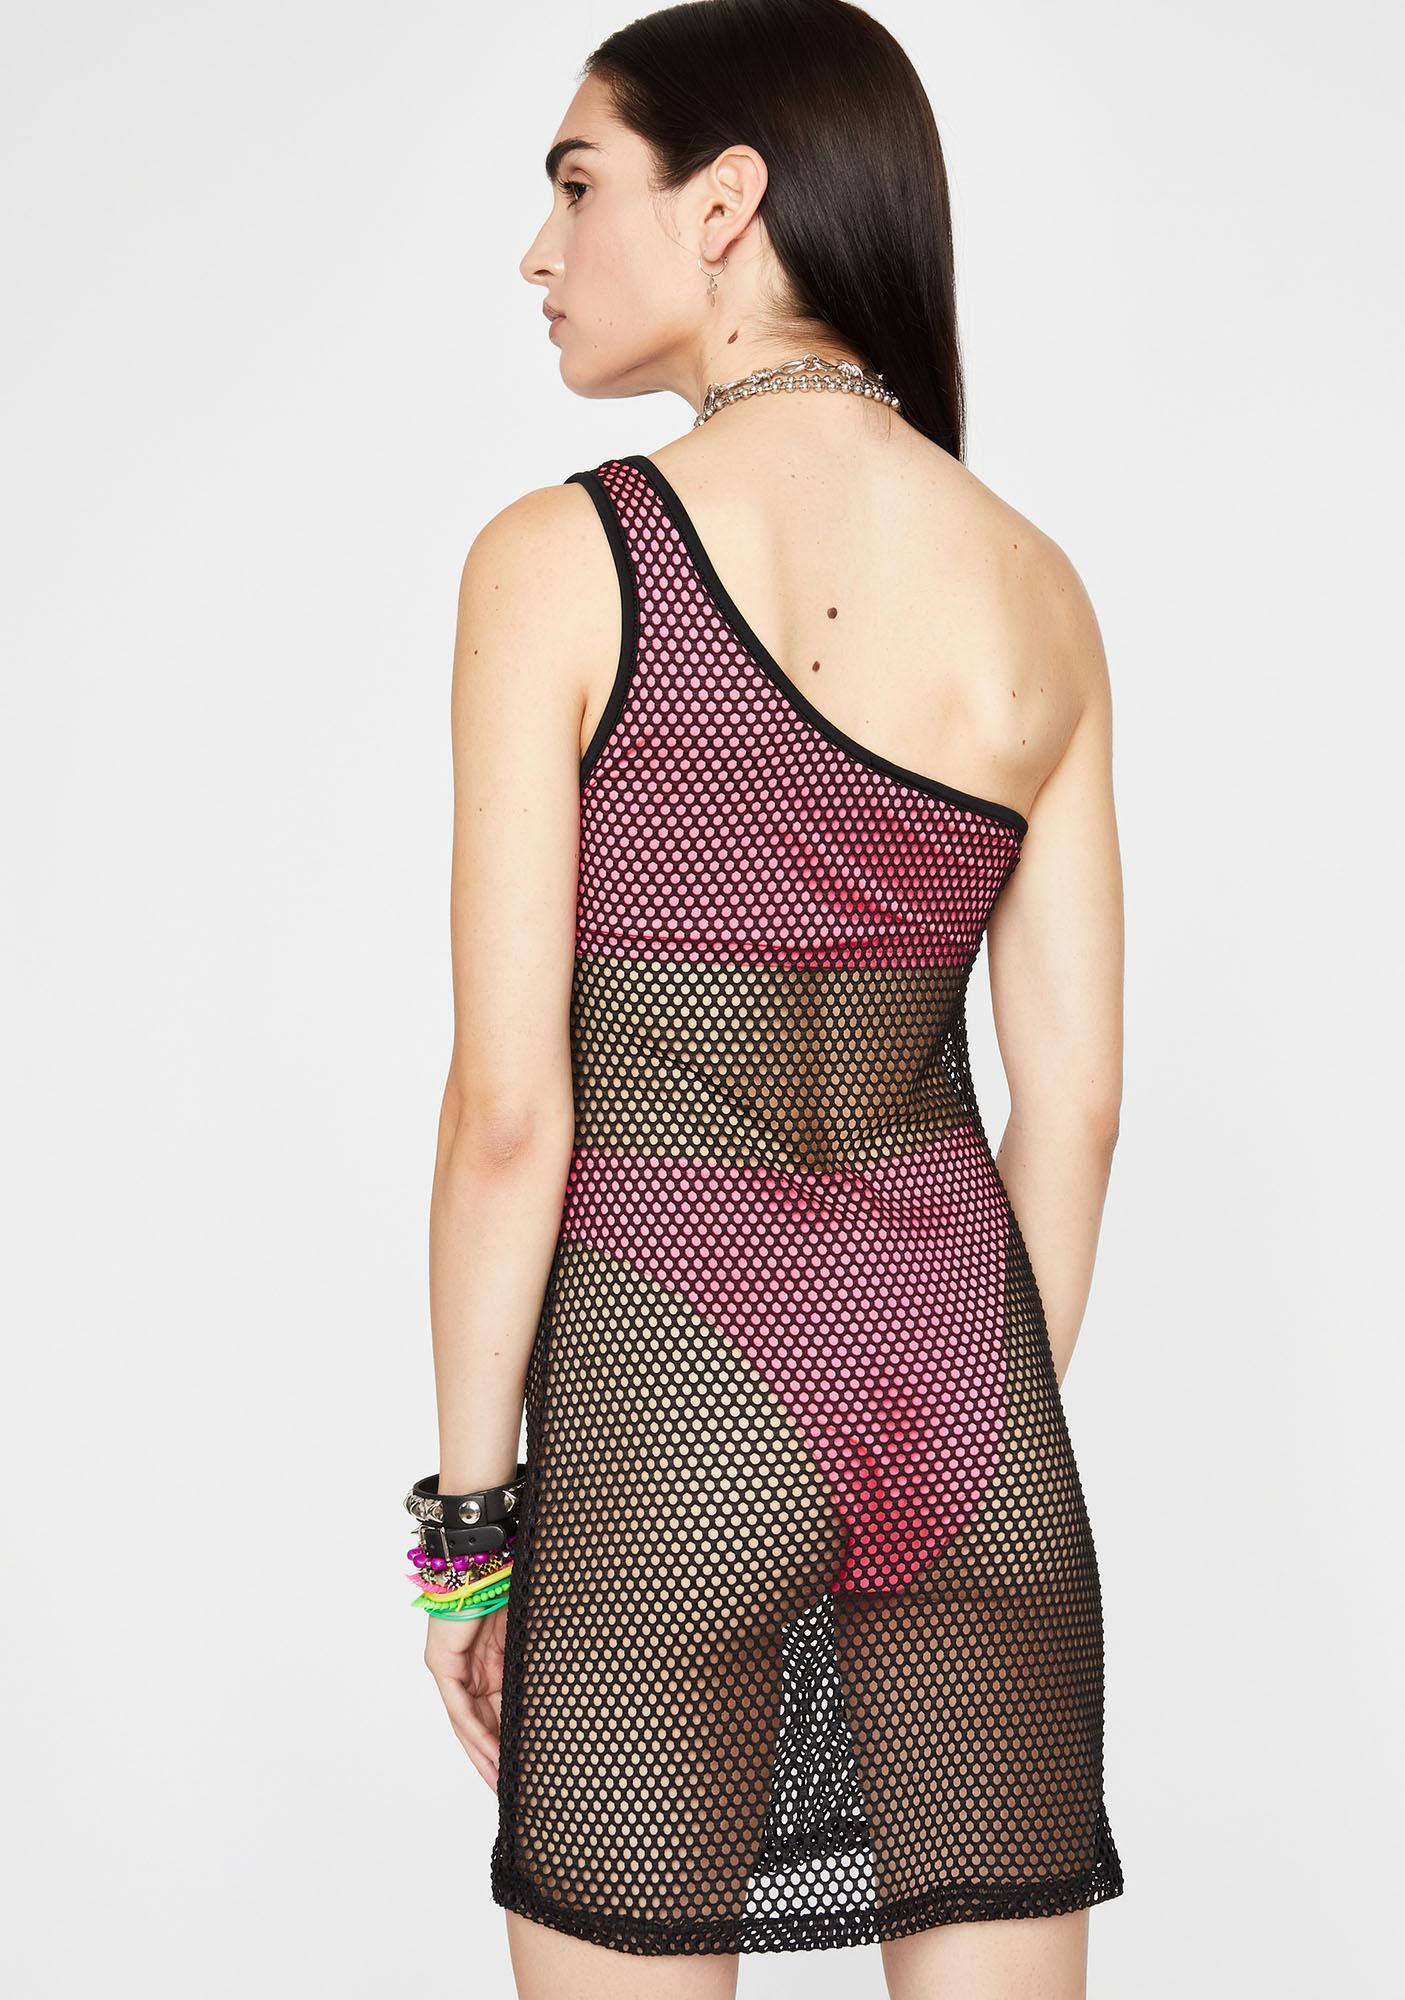 Viral Vibez Fishnet Dress